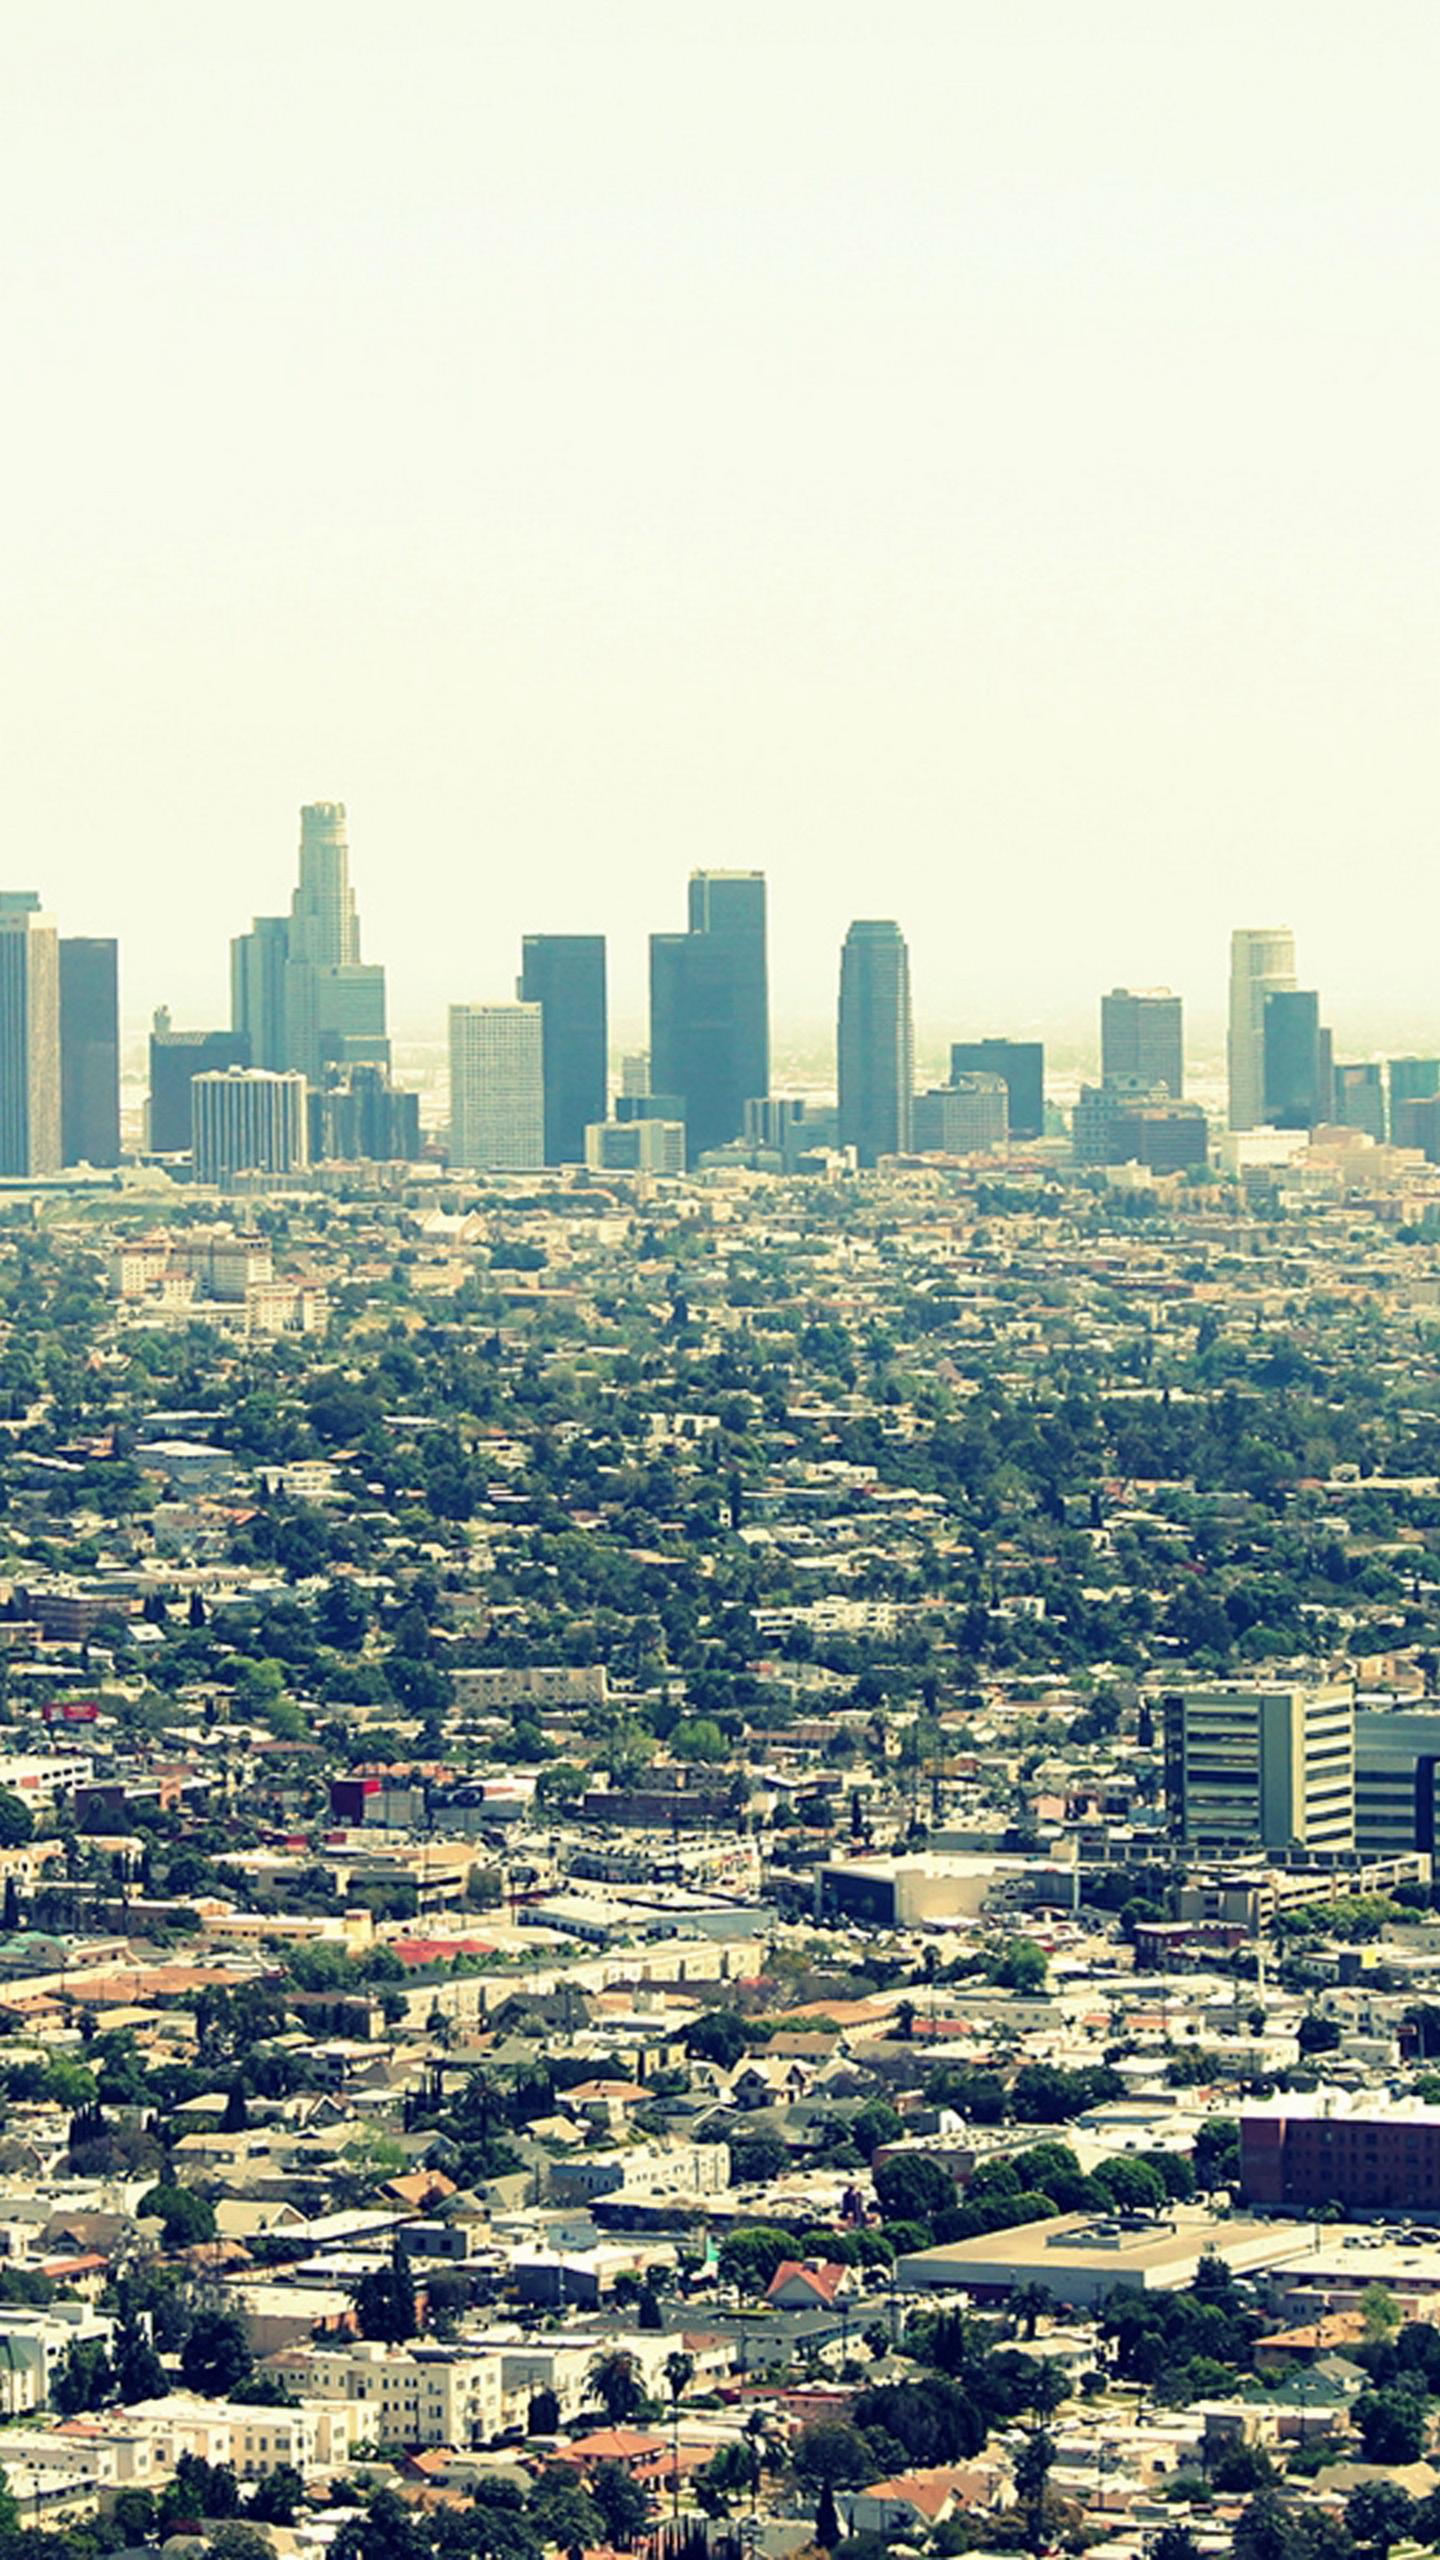 Los Angeles City Wallpaper hd Los Angeles City View Galaxy 1440x2560